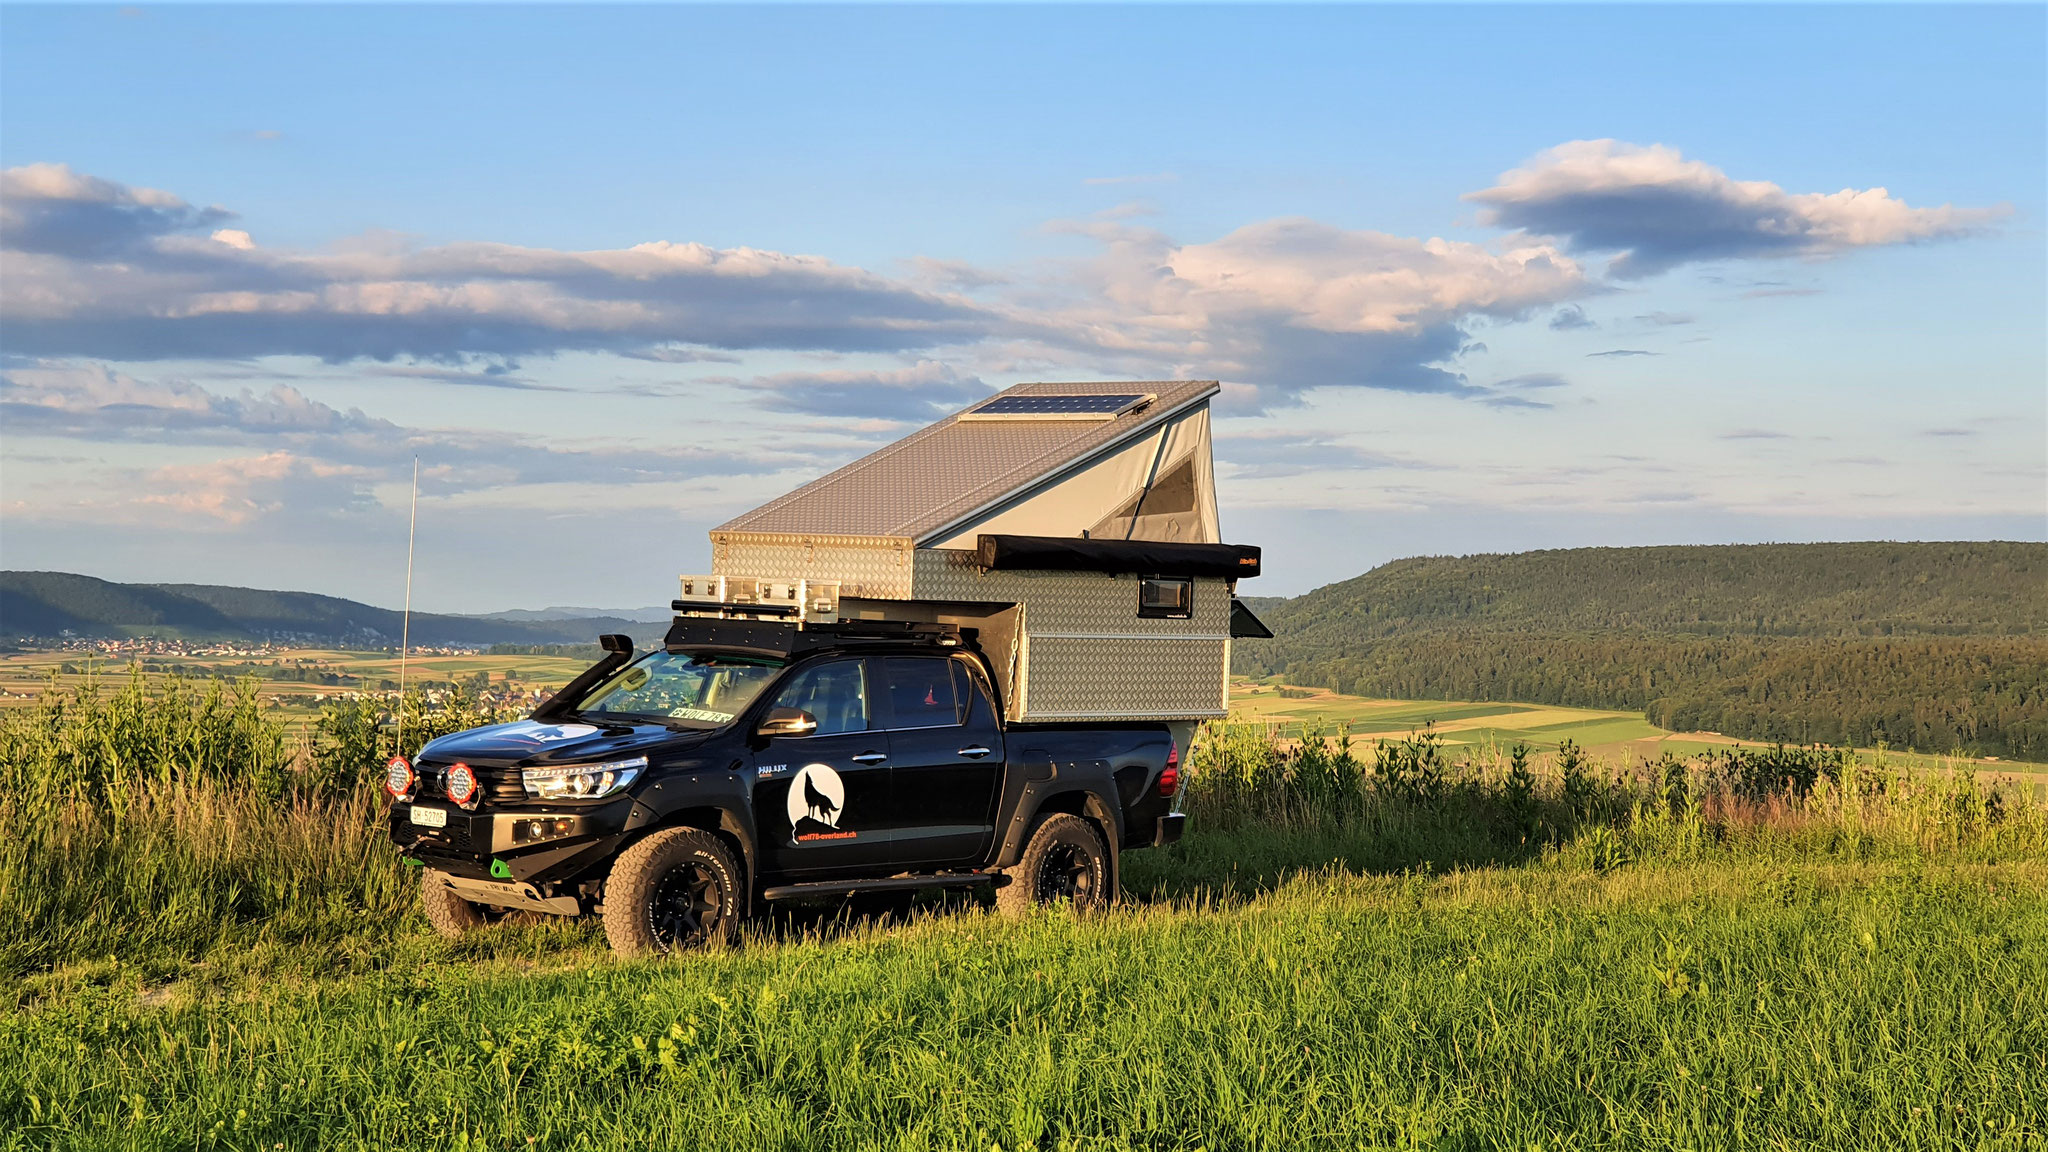 Exkab Defender 130 Wohnkabine Toyota Hilux Pickup camper Revo 2017 2.4 #ProjektBlackwolf truckcamper  4x4 Frontrunner  Roofrack  offroad Tacoma expedition overland wolf78-overland.ch